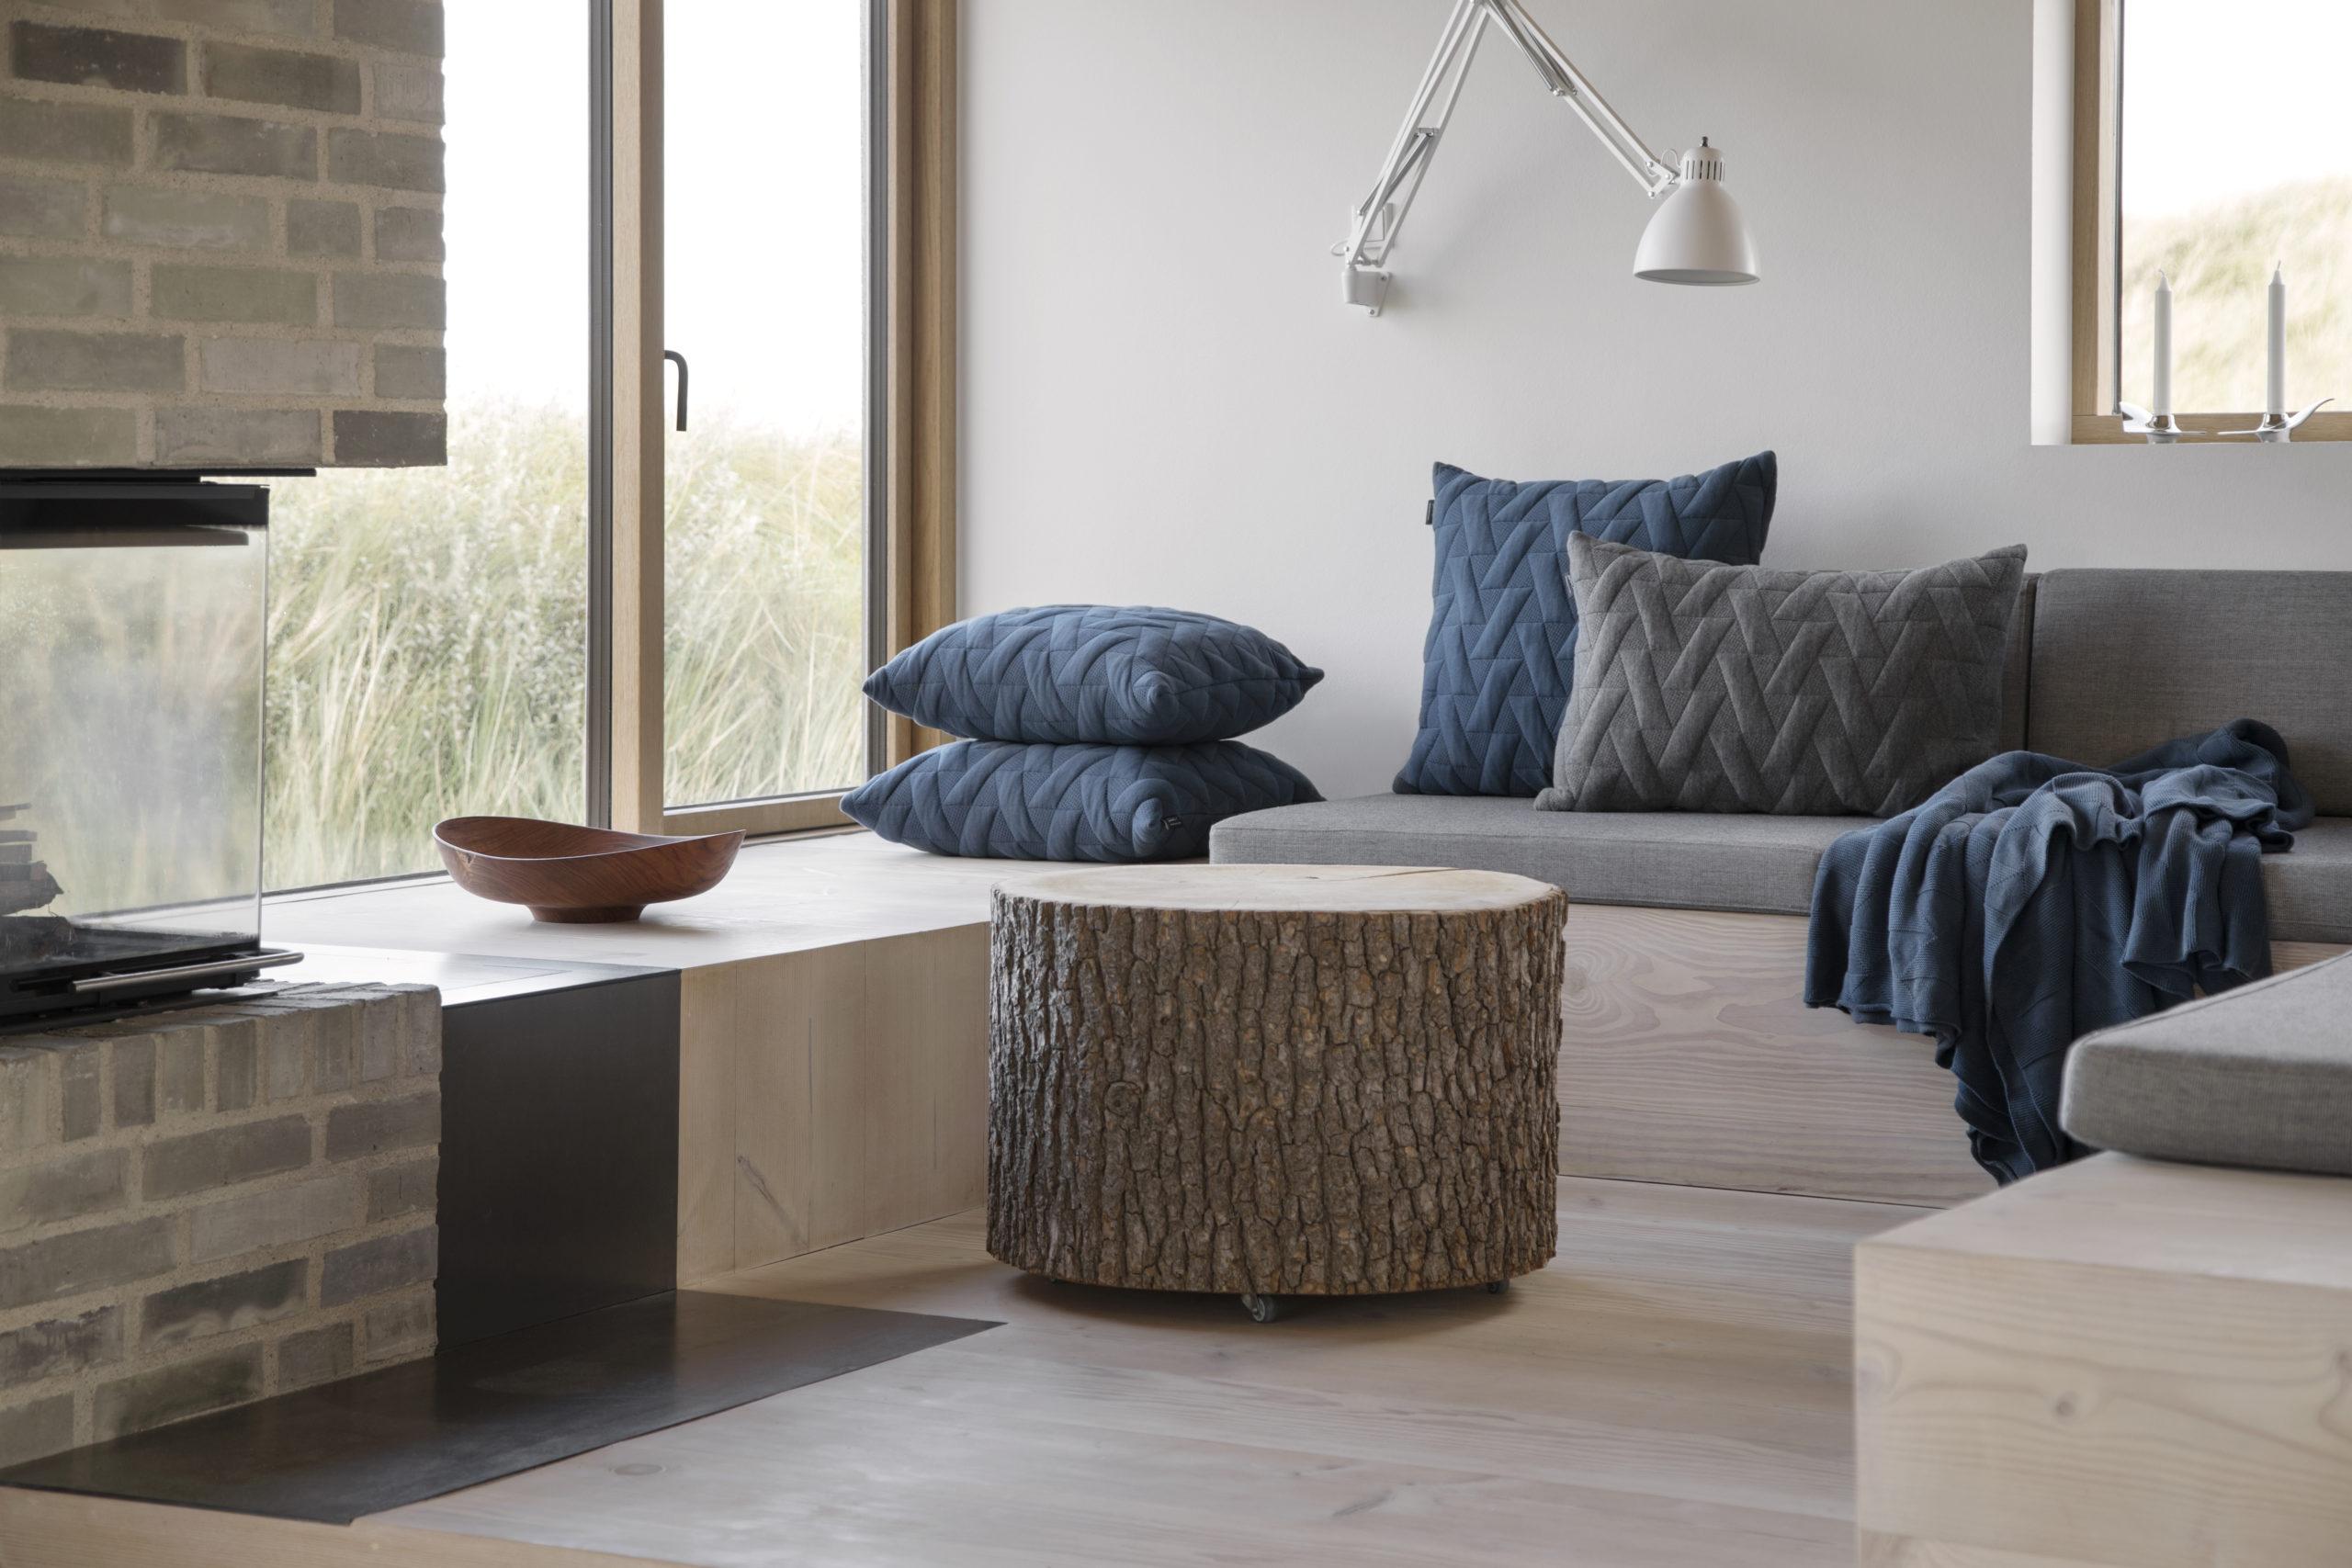 Architectmade-FJ-Pattern-Organic-Cotton-Pillows-Blankets-Denmark-Finn-Juhl-2